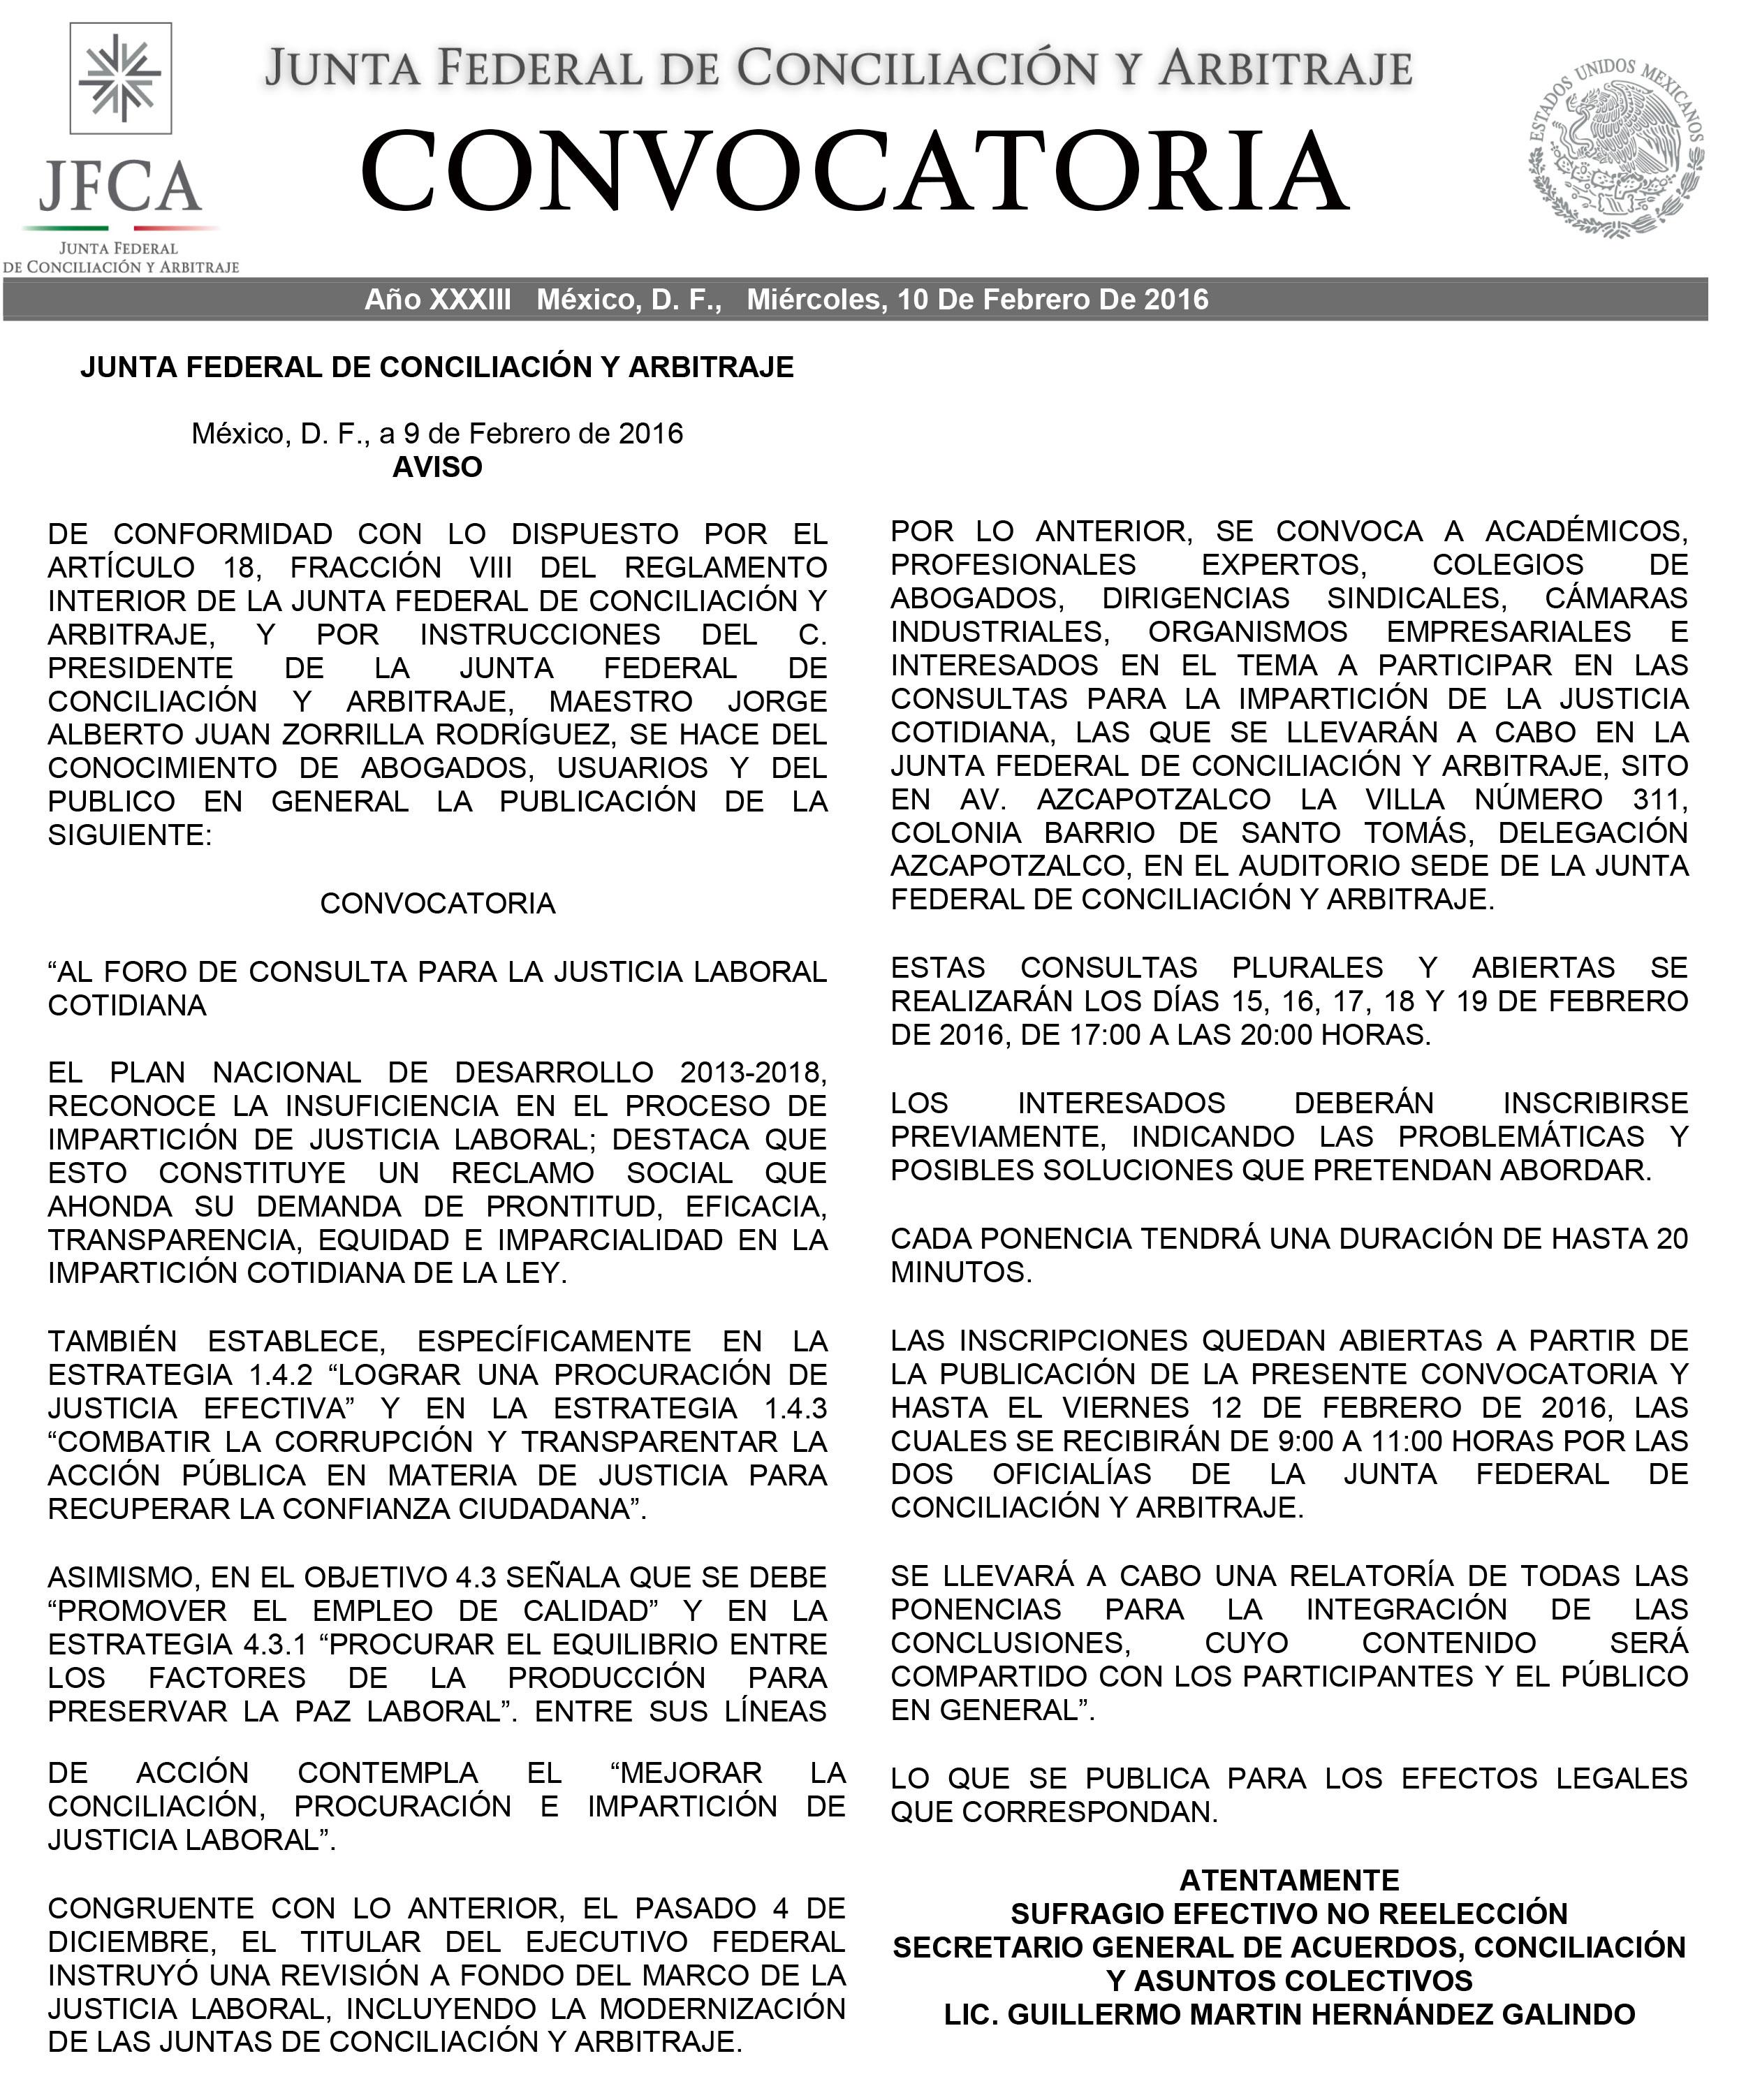 Convocatoria JFCA Foros de Consultajpg